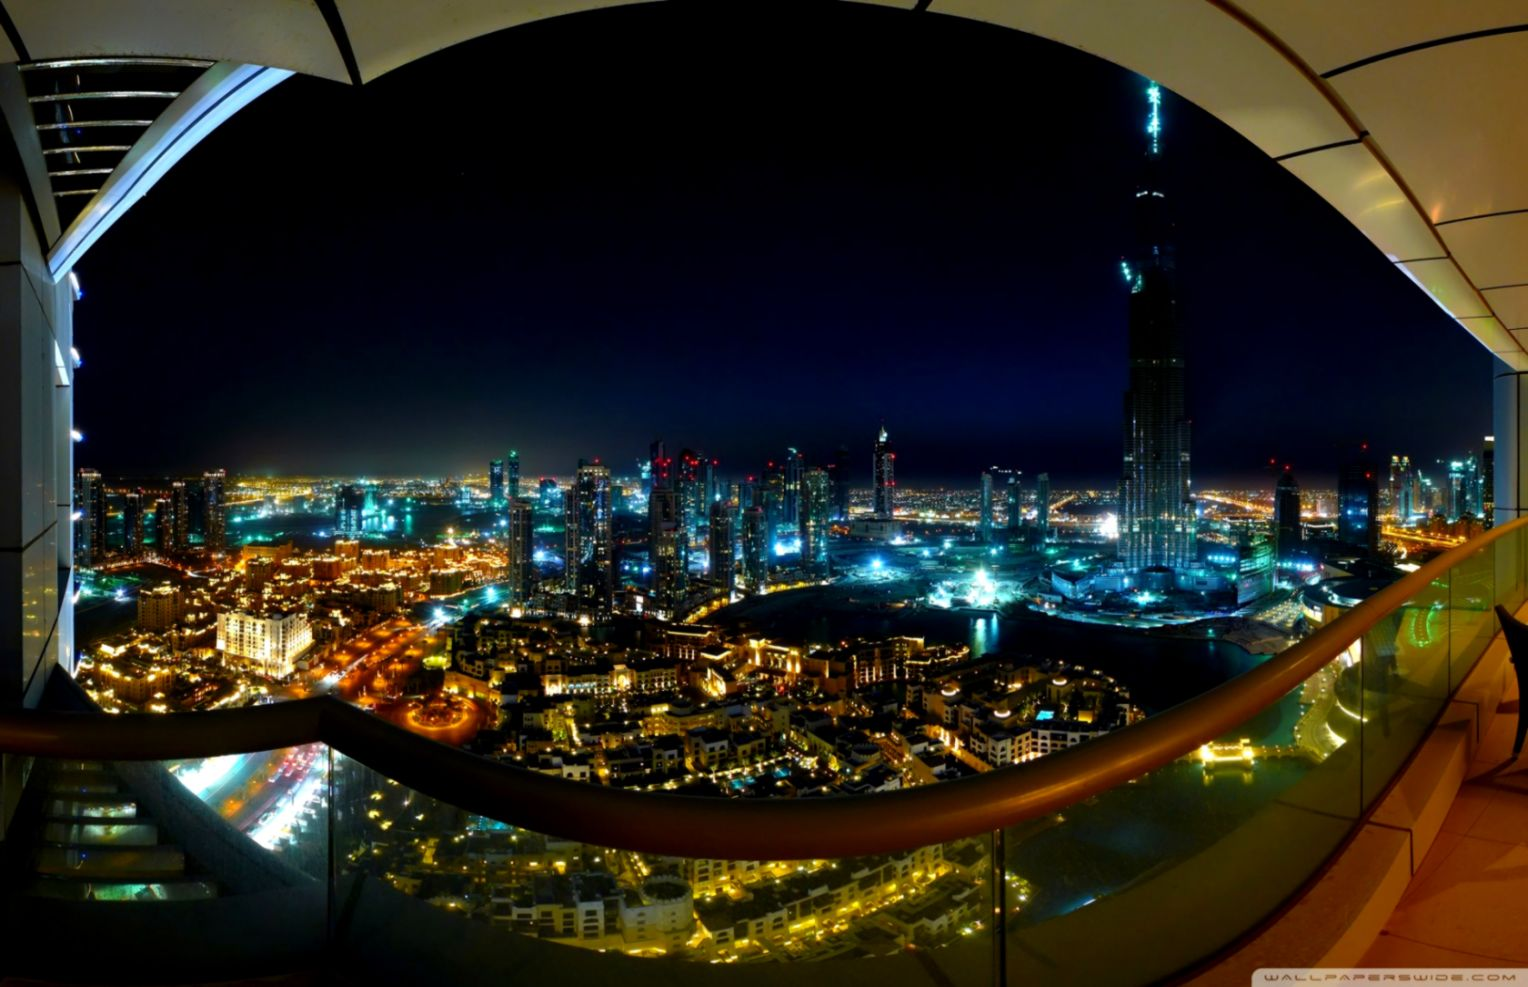 Dubai City 4k Hd Desktop Wallpaper For 4k Ultra Hd Dubai By Night 1080p 3225572 Hd Wallpaper Backgrounds Download